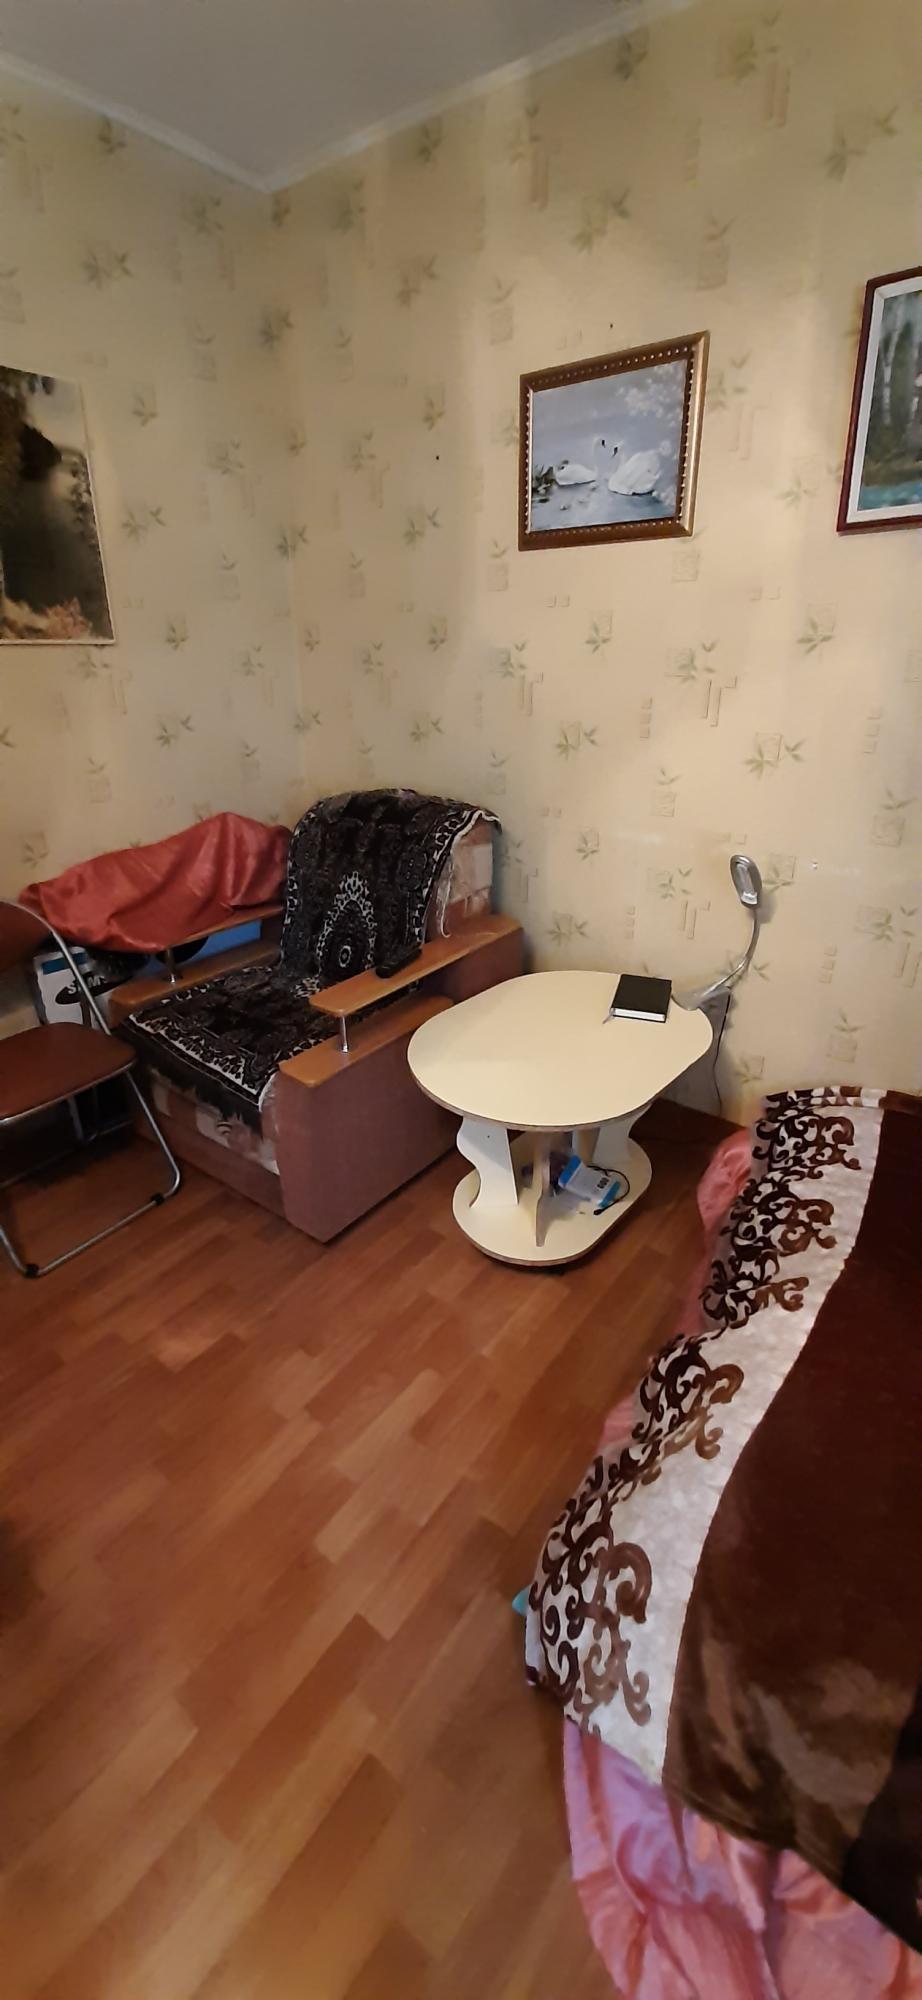 2к квартира улица Воронова, 18 корпус 2 | 15000 | аренда в Красноярске фото 1